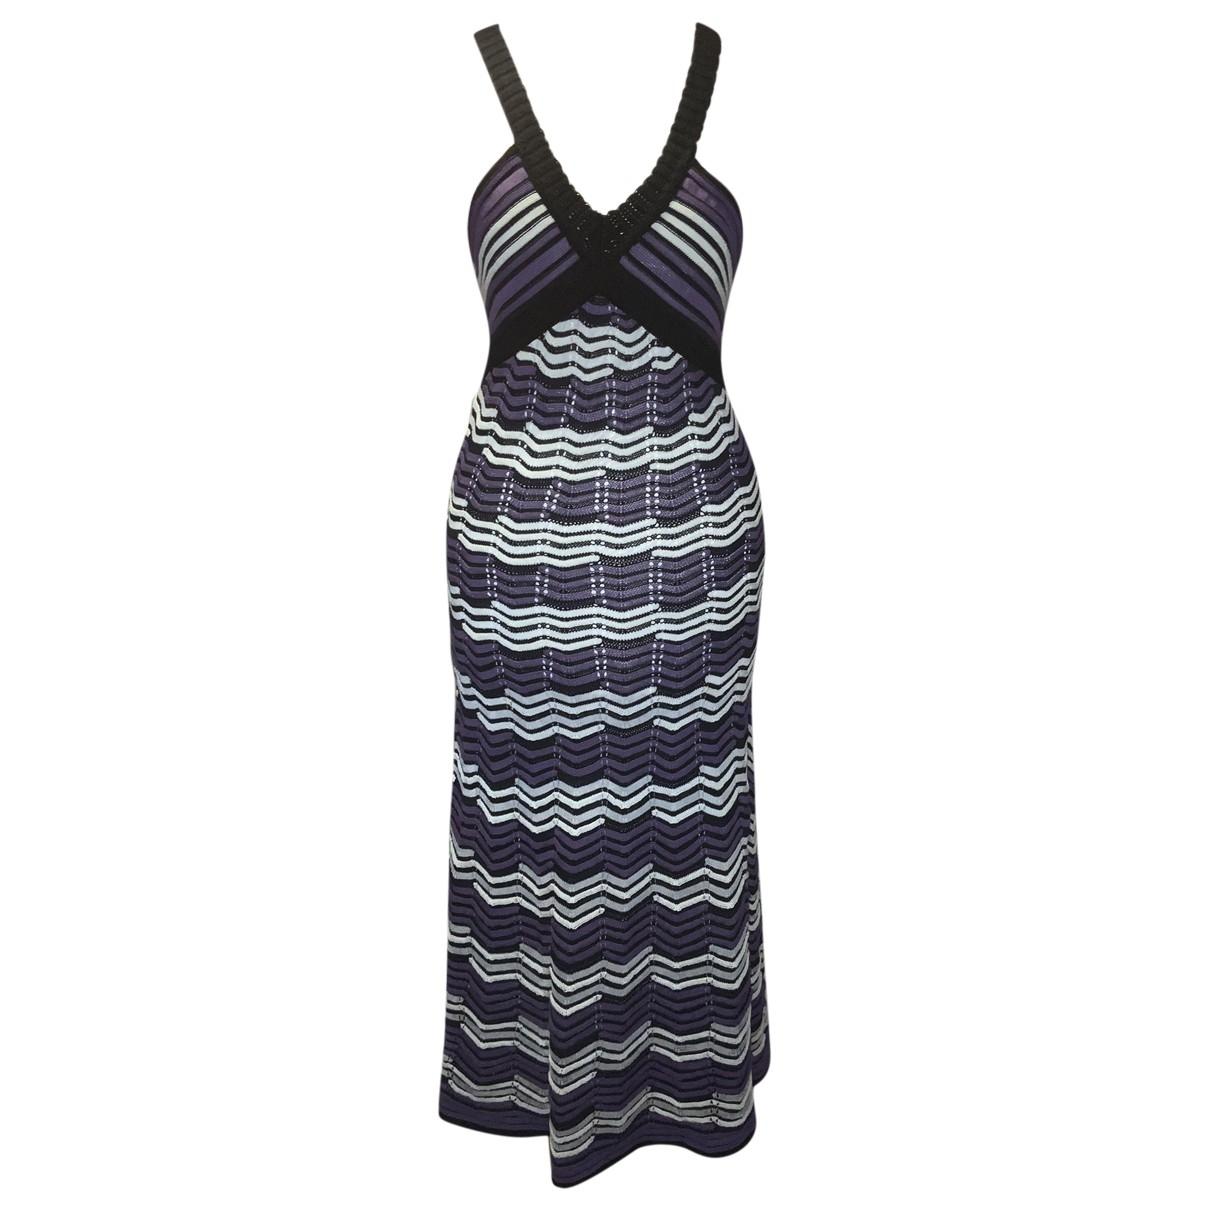 M Missoni \N Purple Cotton dress for Women 42 IT